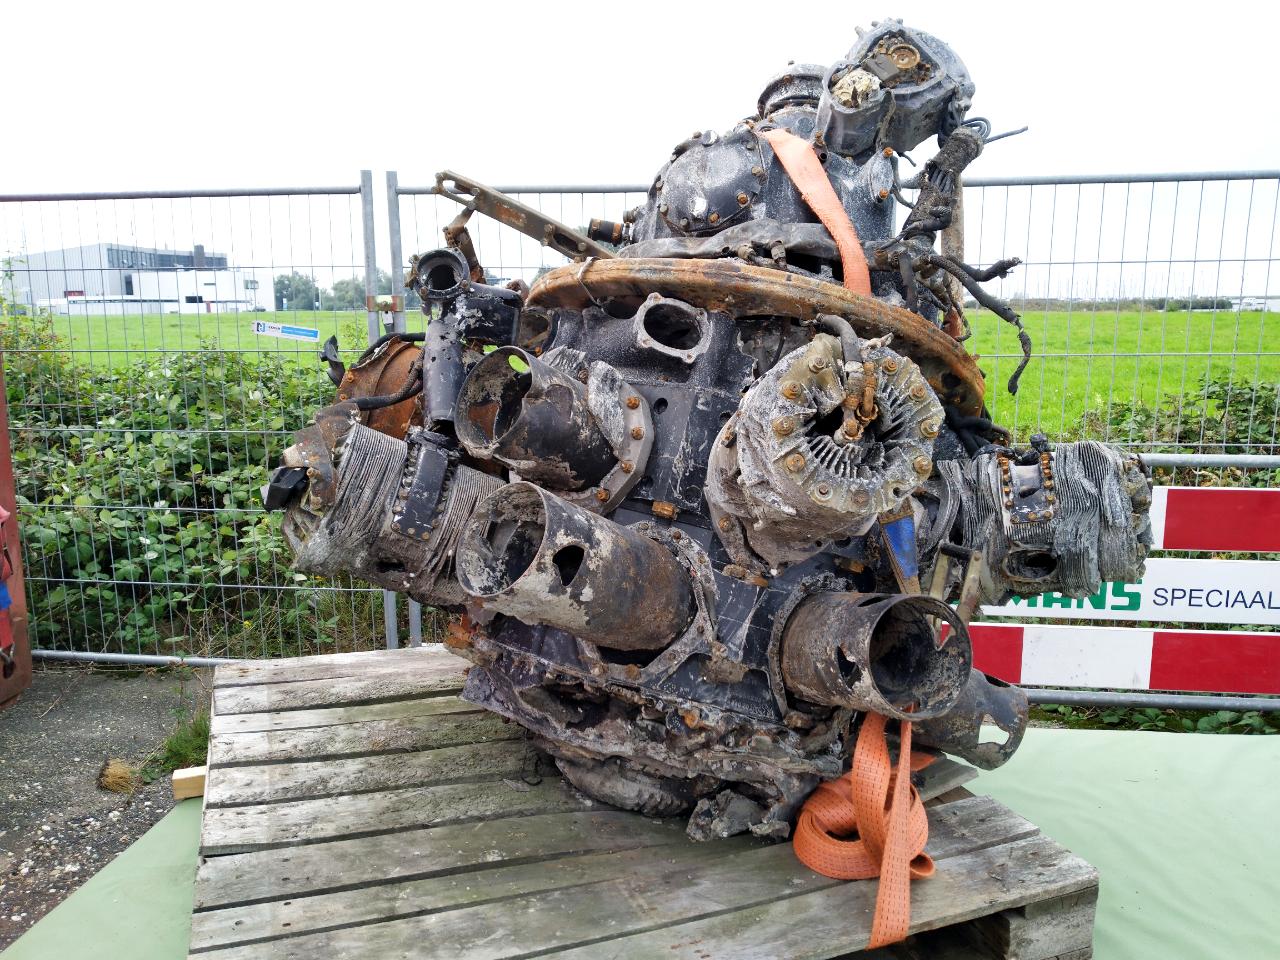 Sunken history: raising the wreck of a wartime bomber piece by piece - DutchNews.nl